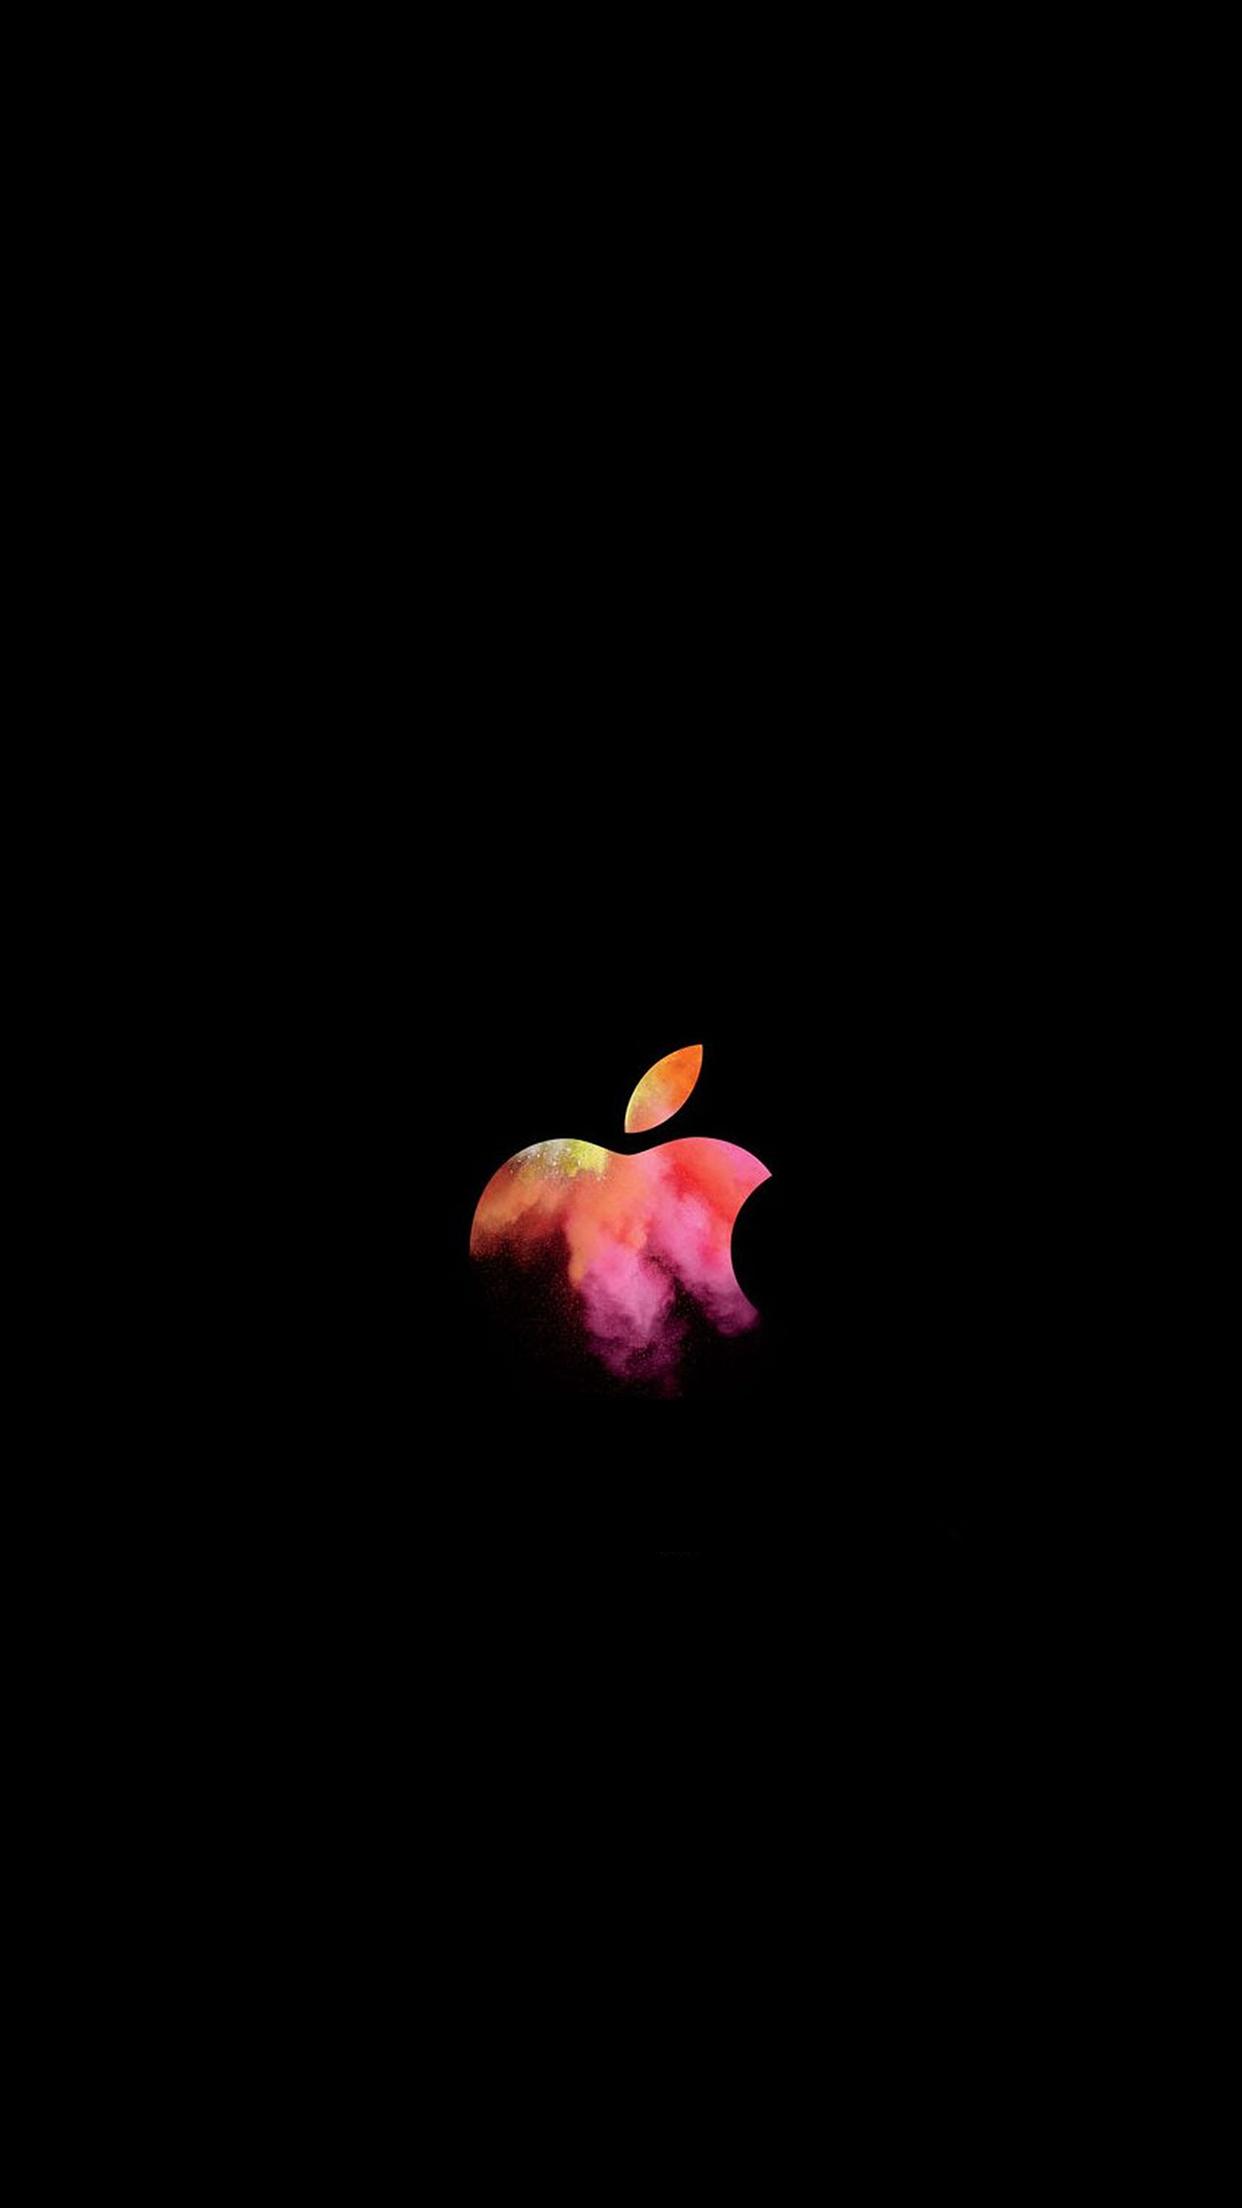 Iphone Apple Ultra Hd Apple Iphone Black Wallpaper Hd Apple Iphone Wallpaper Hd Black Apple Wallpaper Apple Wallpaper